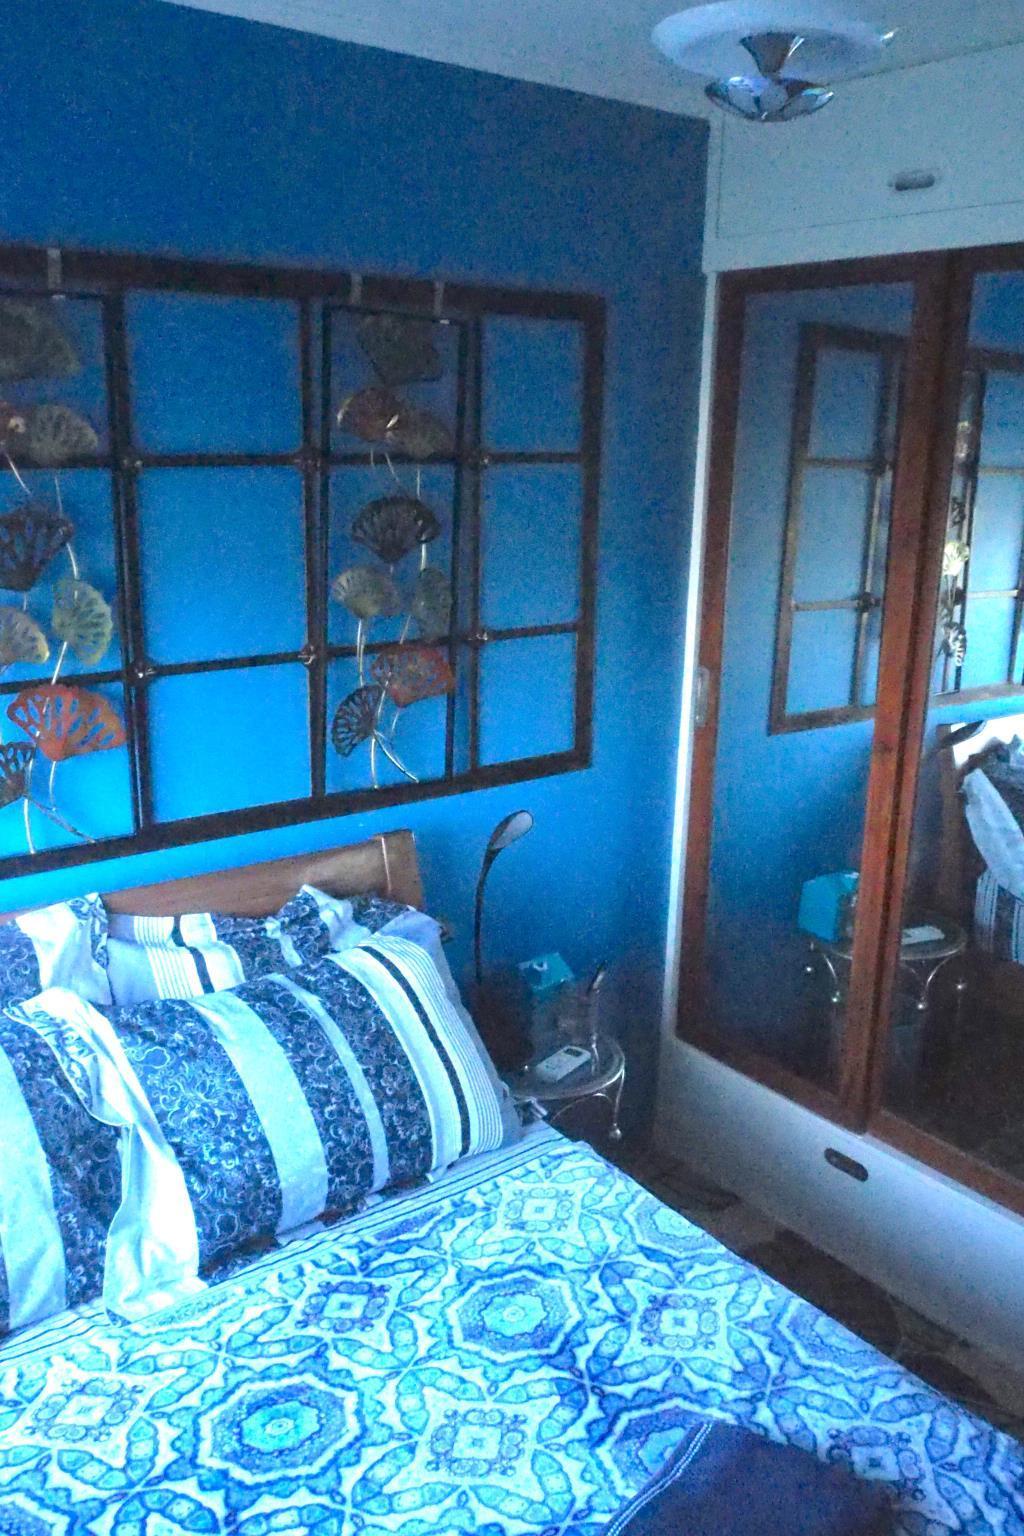 Best Price on Blue Apartment in Cebu + Reviews!